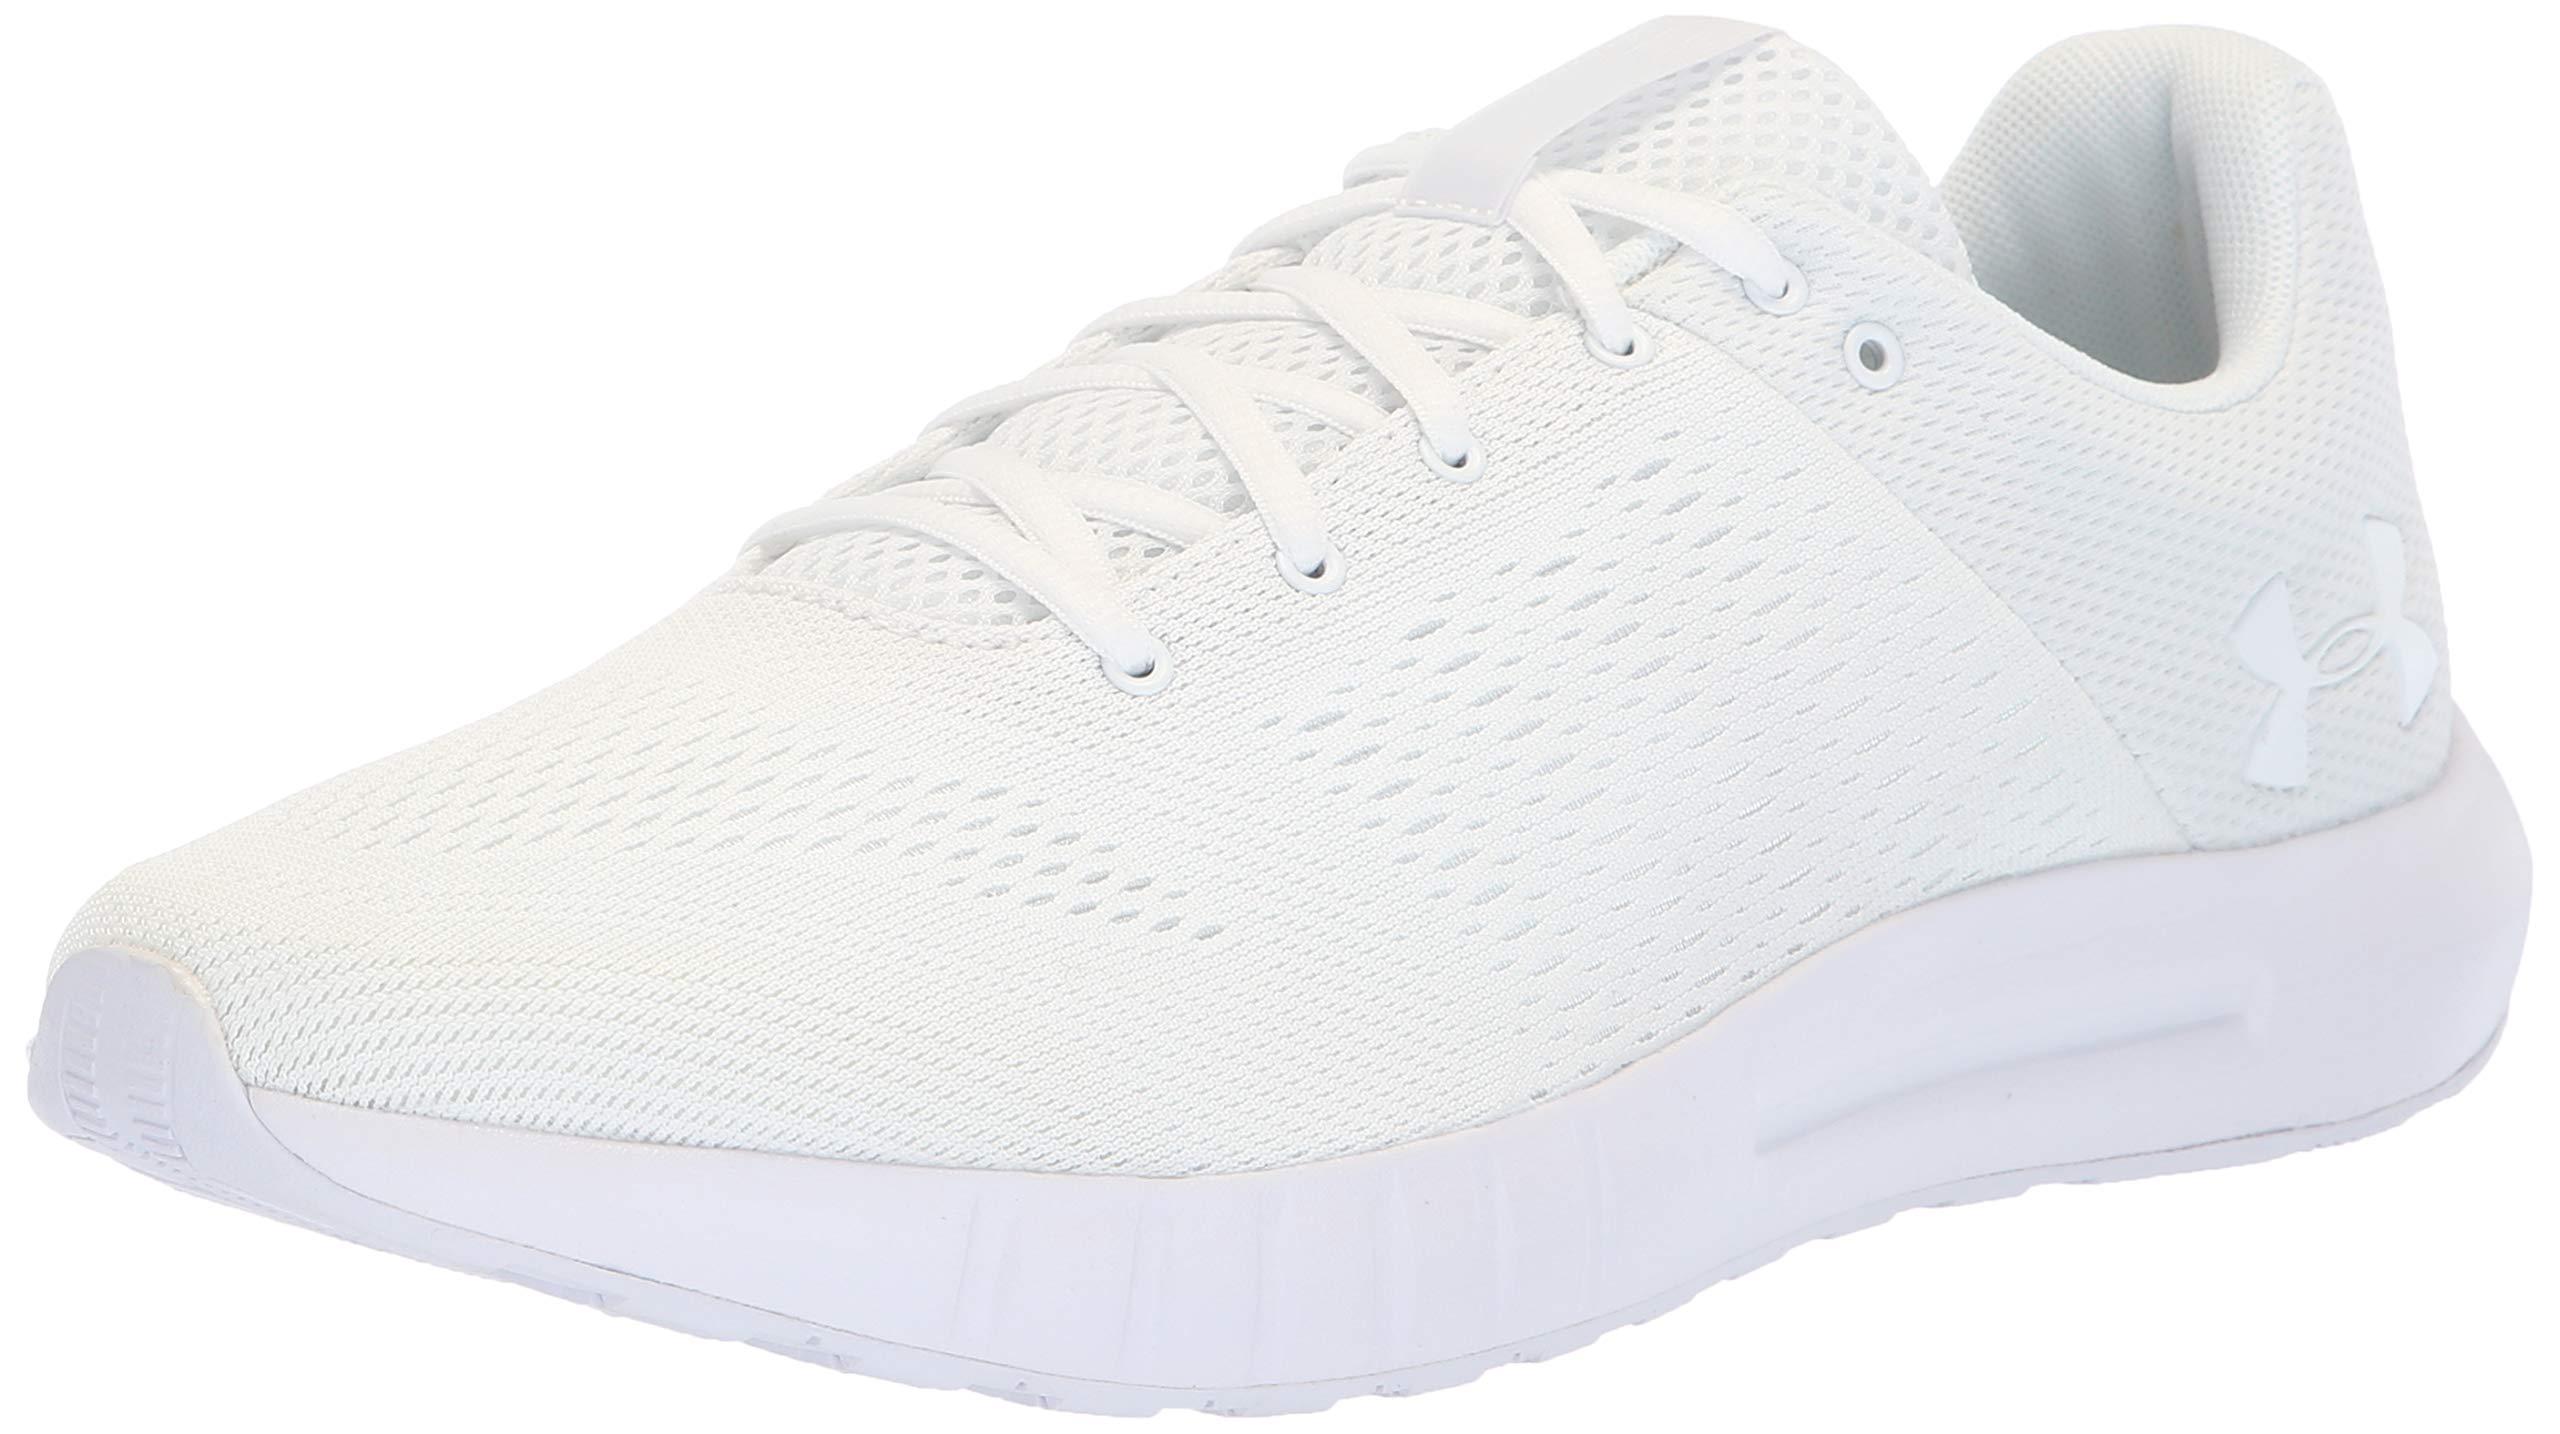 Under Armour Men's Micro G Pursuit Running Shoe, White (113), 9.5